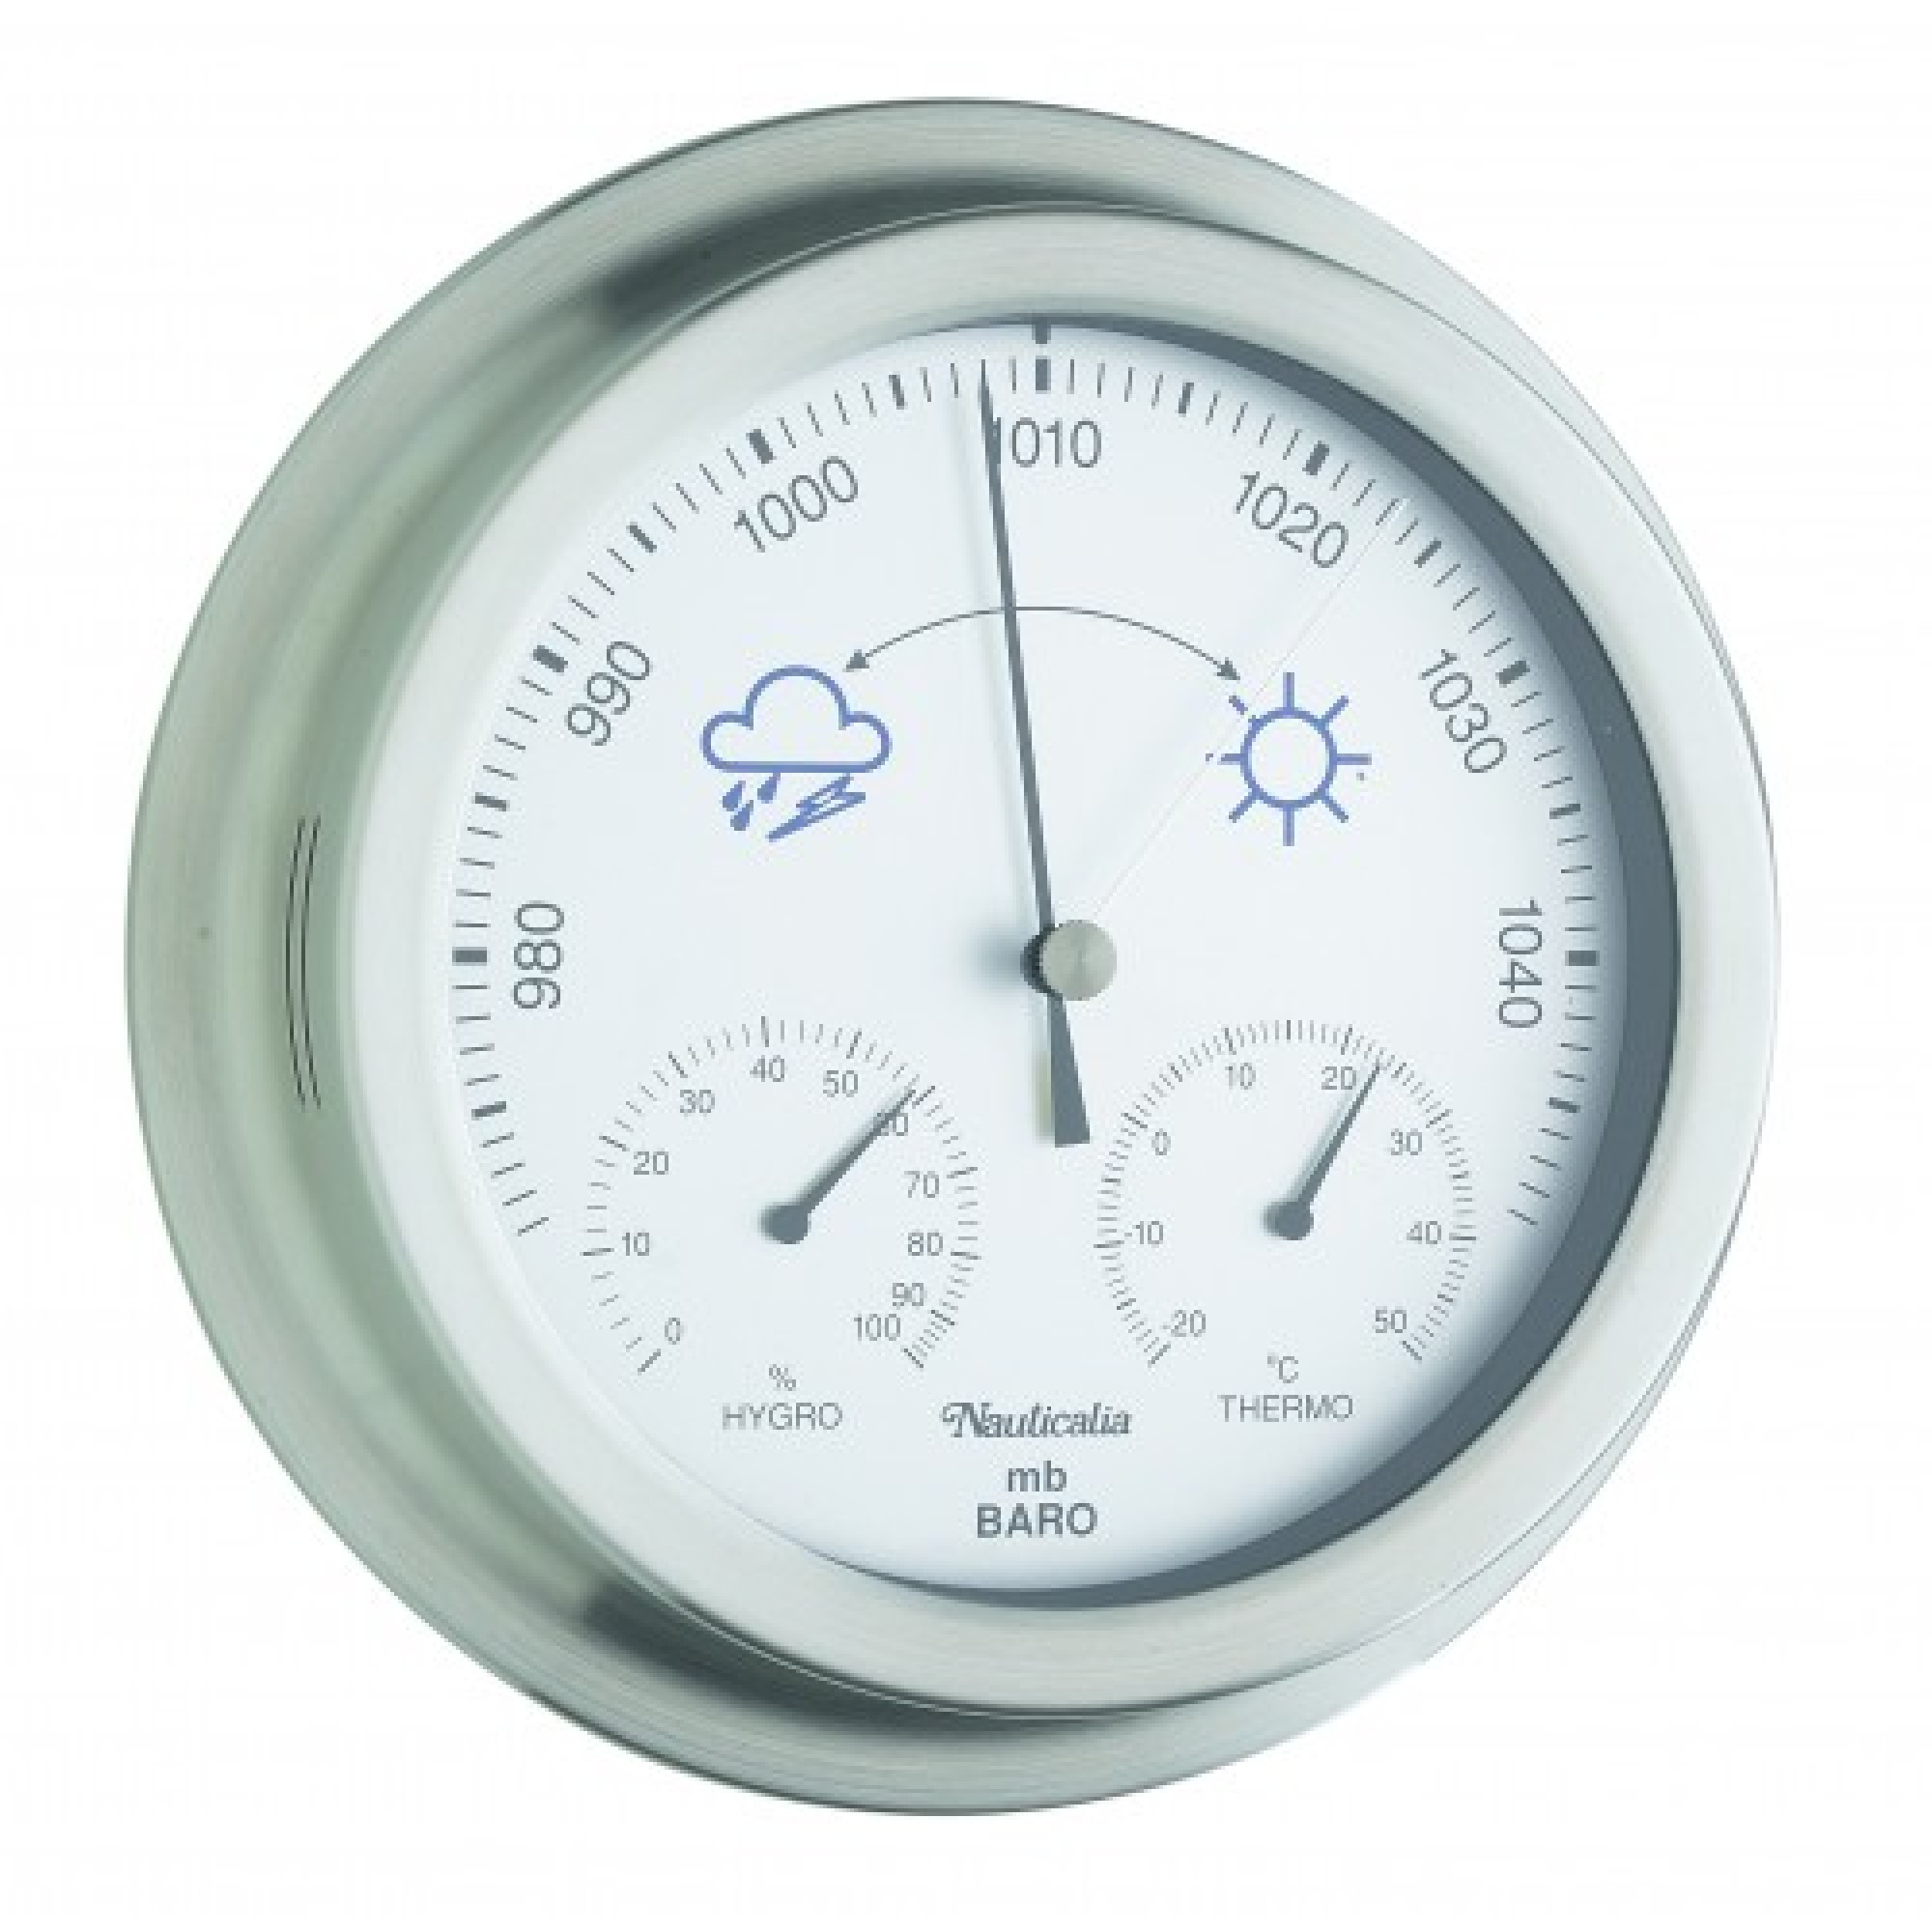 Stainless Steel Barometer